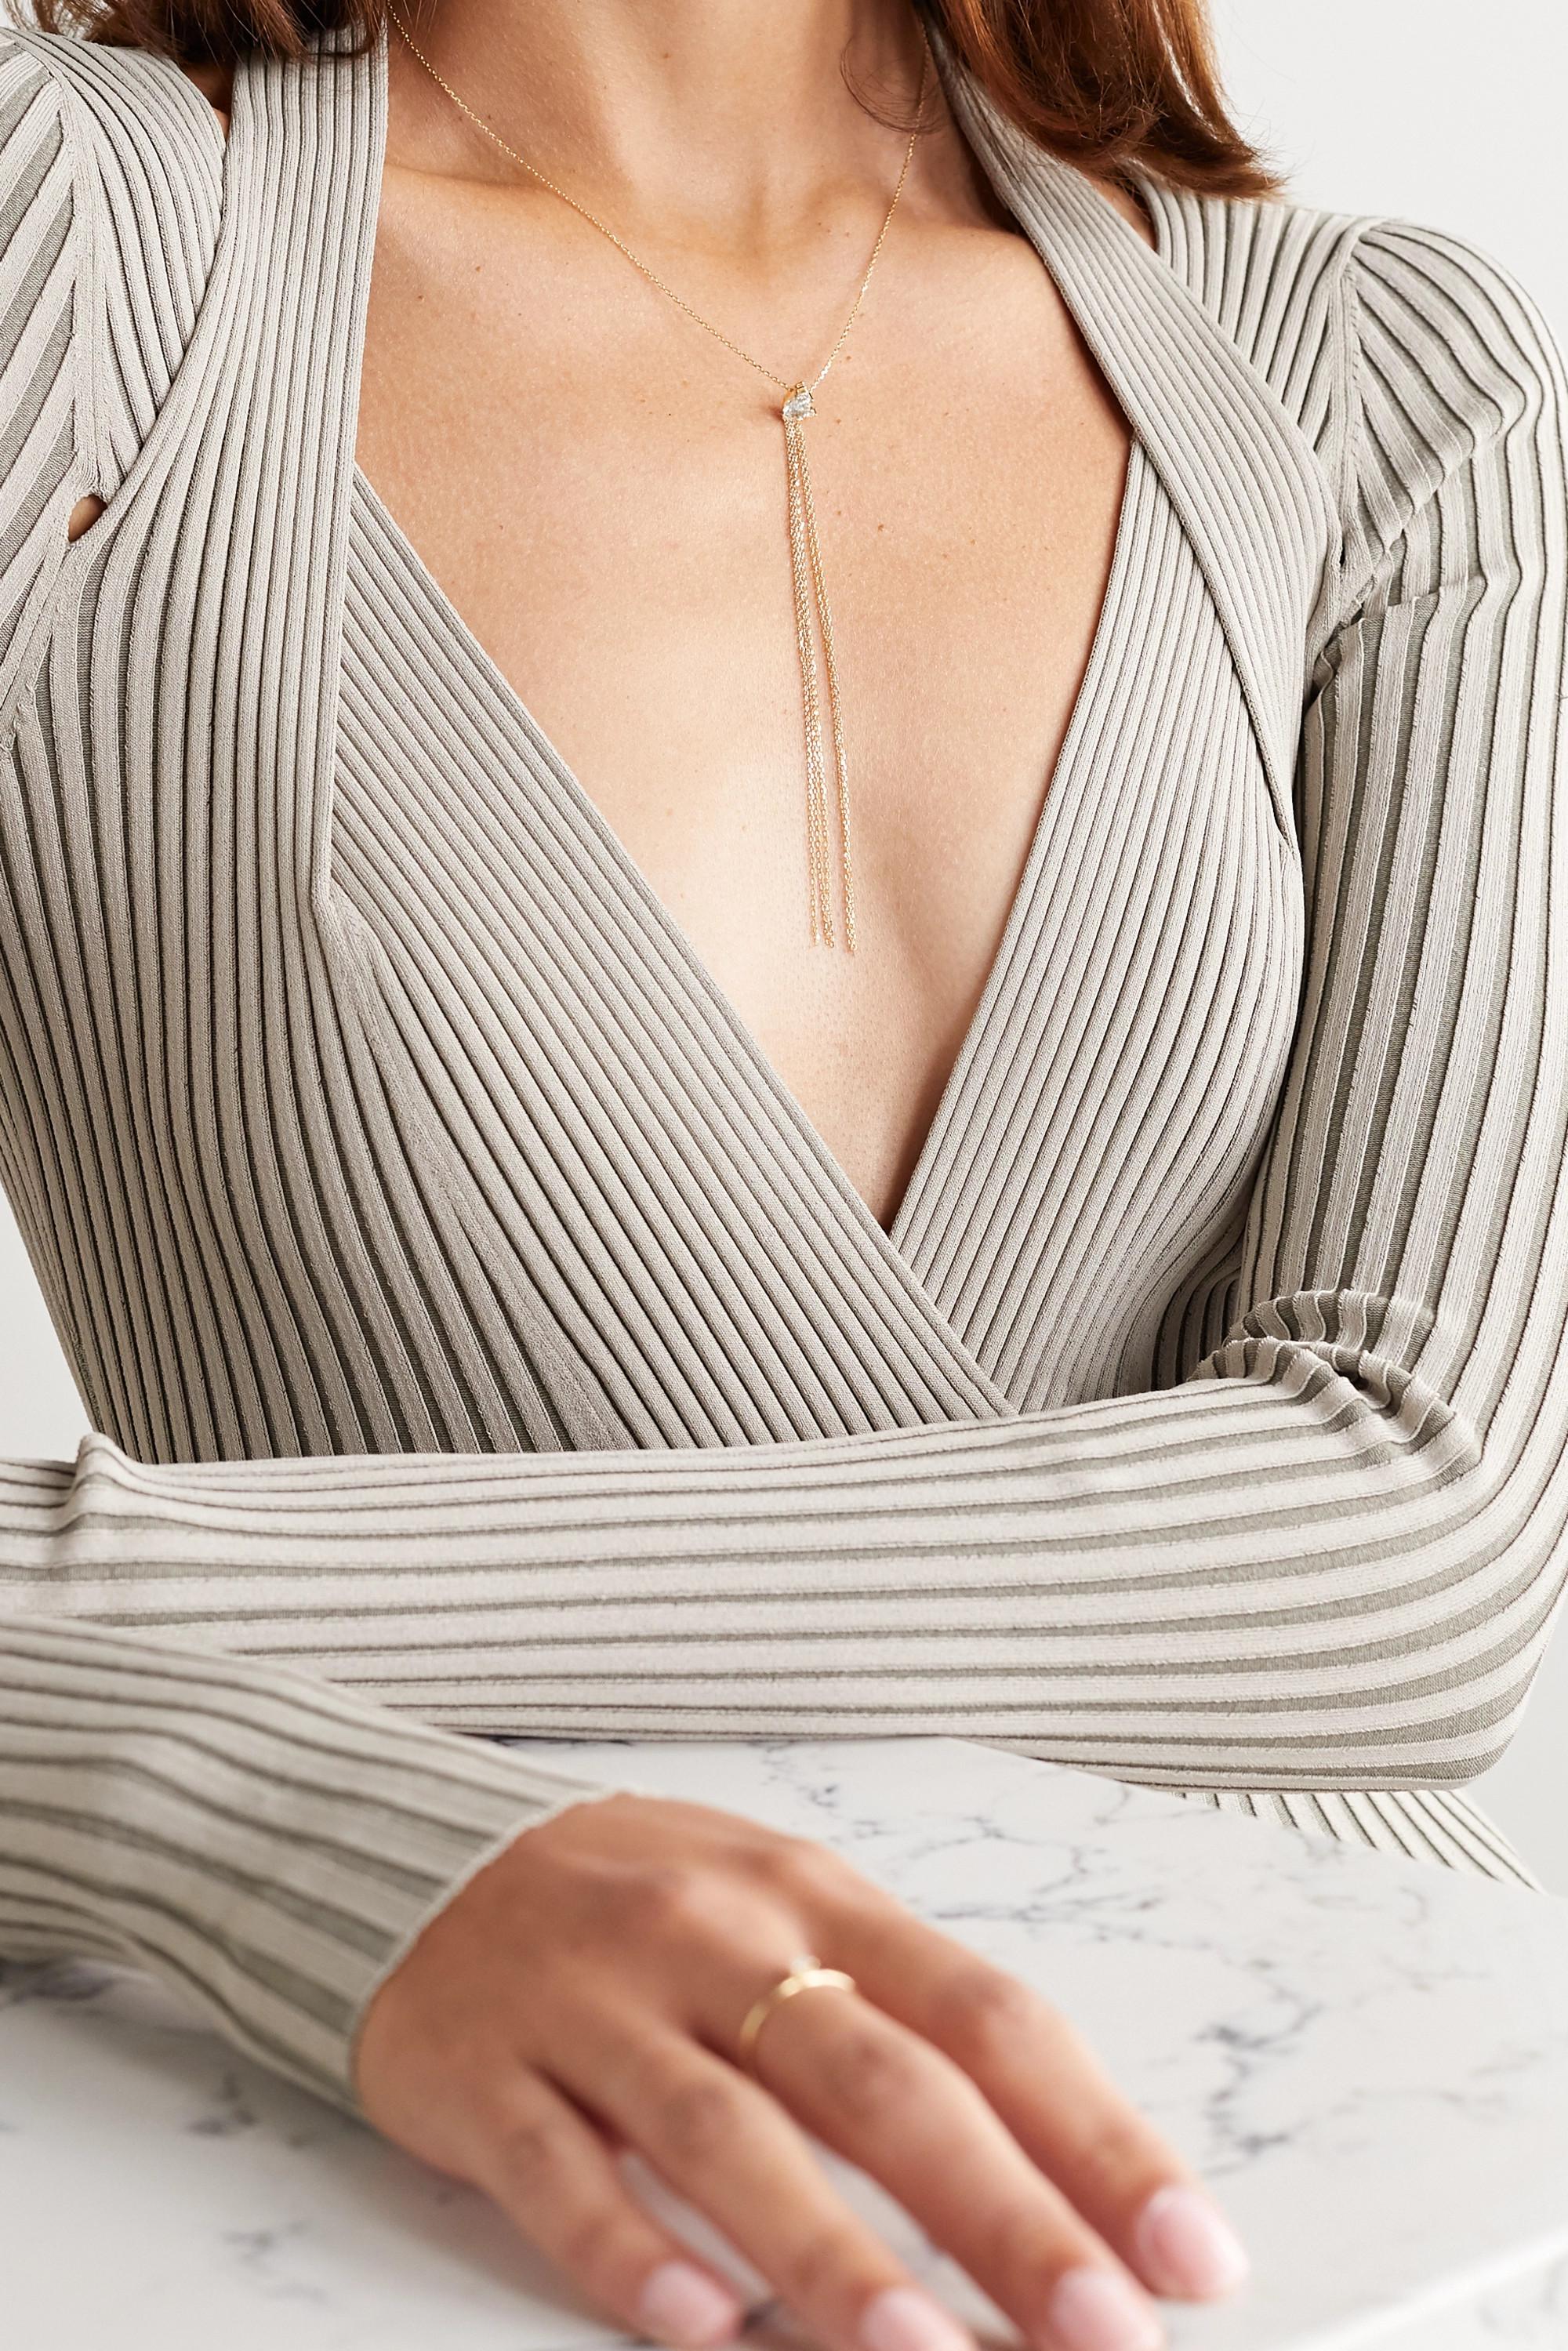 Mizuki 14-karat gold, diamond and topaz necklace